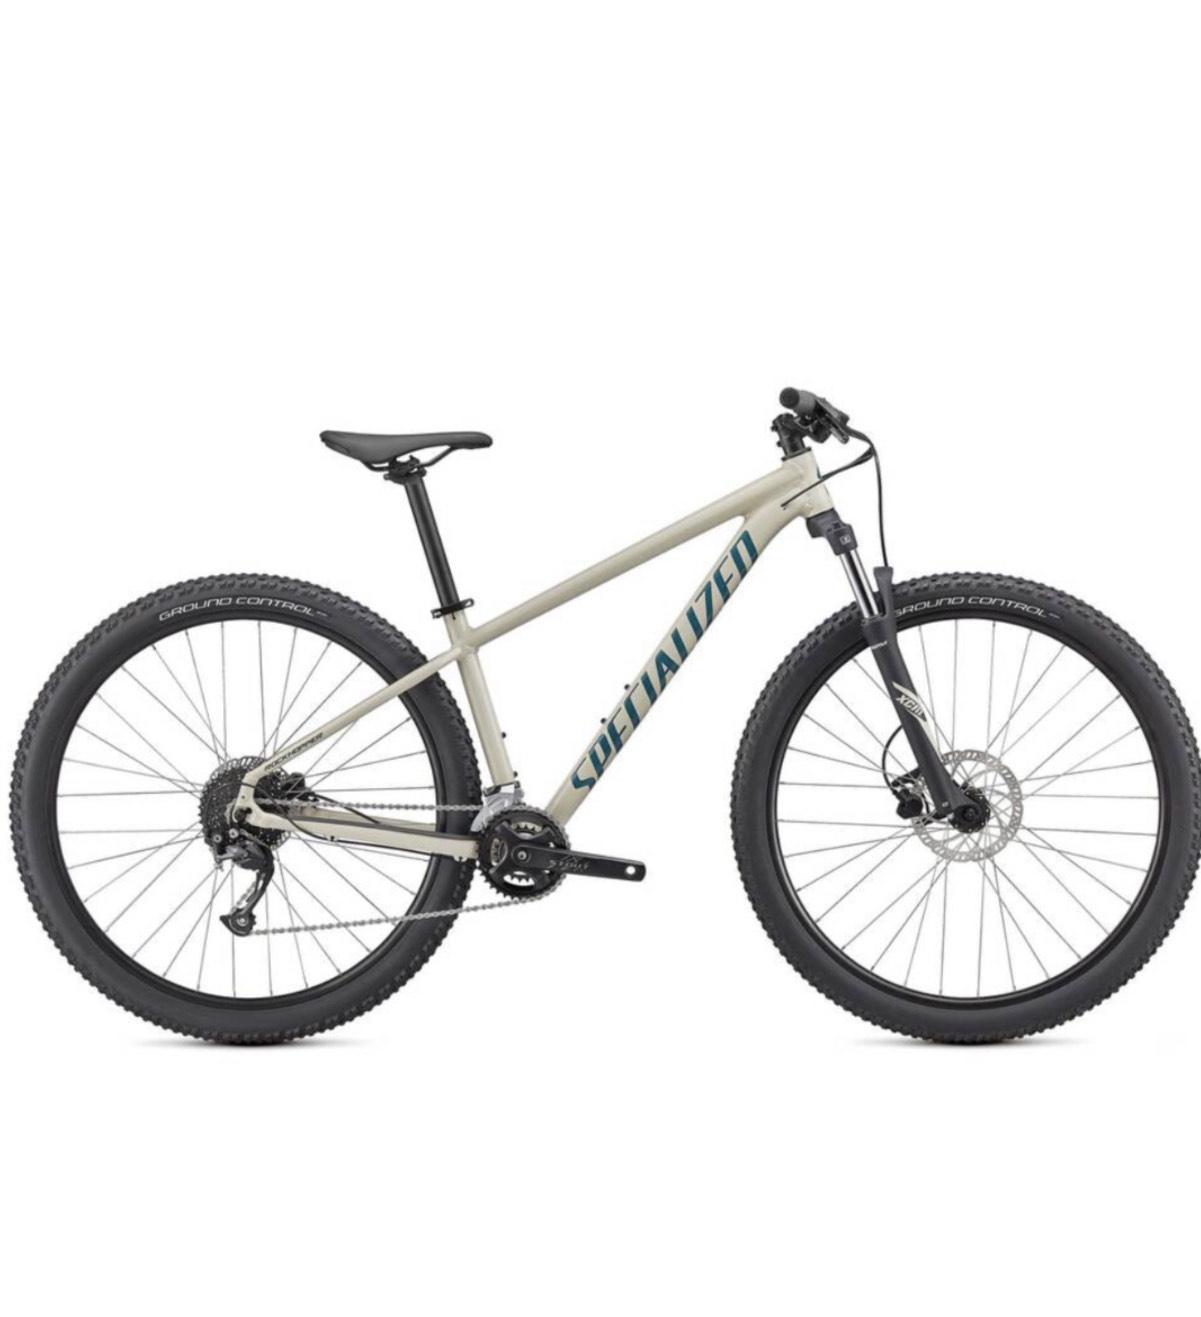 Specialized Rockhopper Sport 2021 Mountain Bike £450 @ Evans Cycles